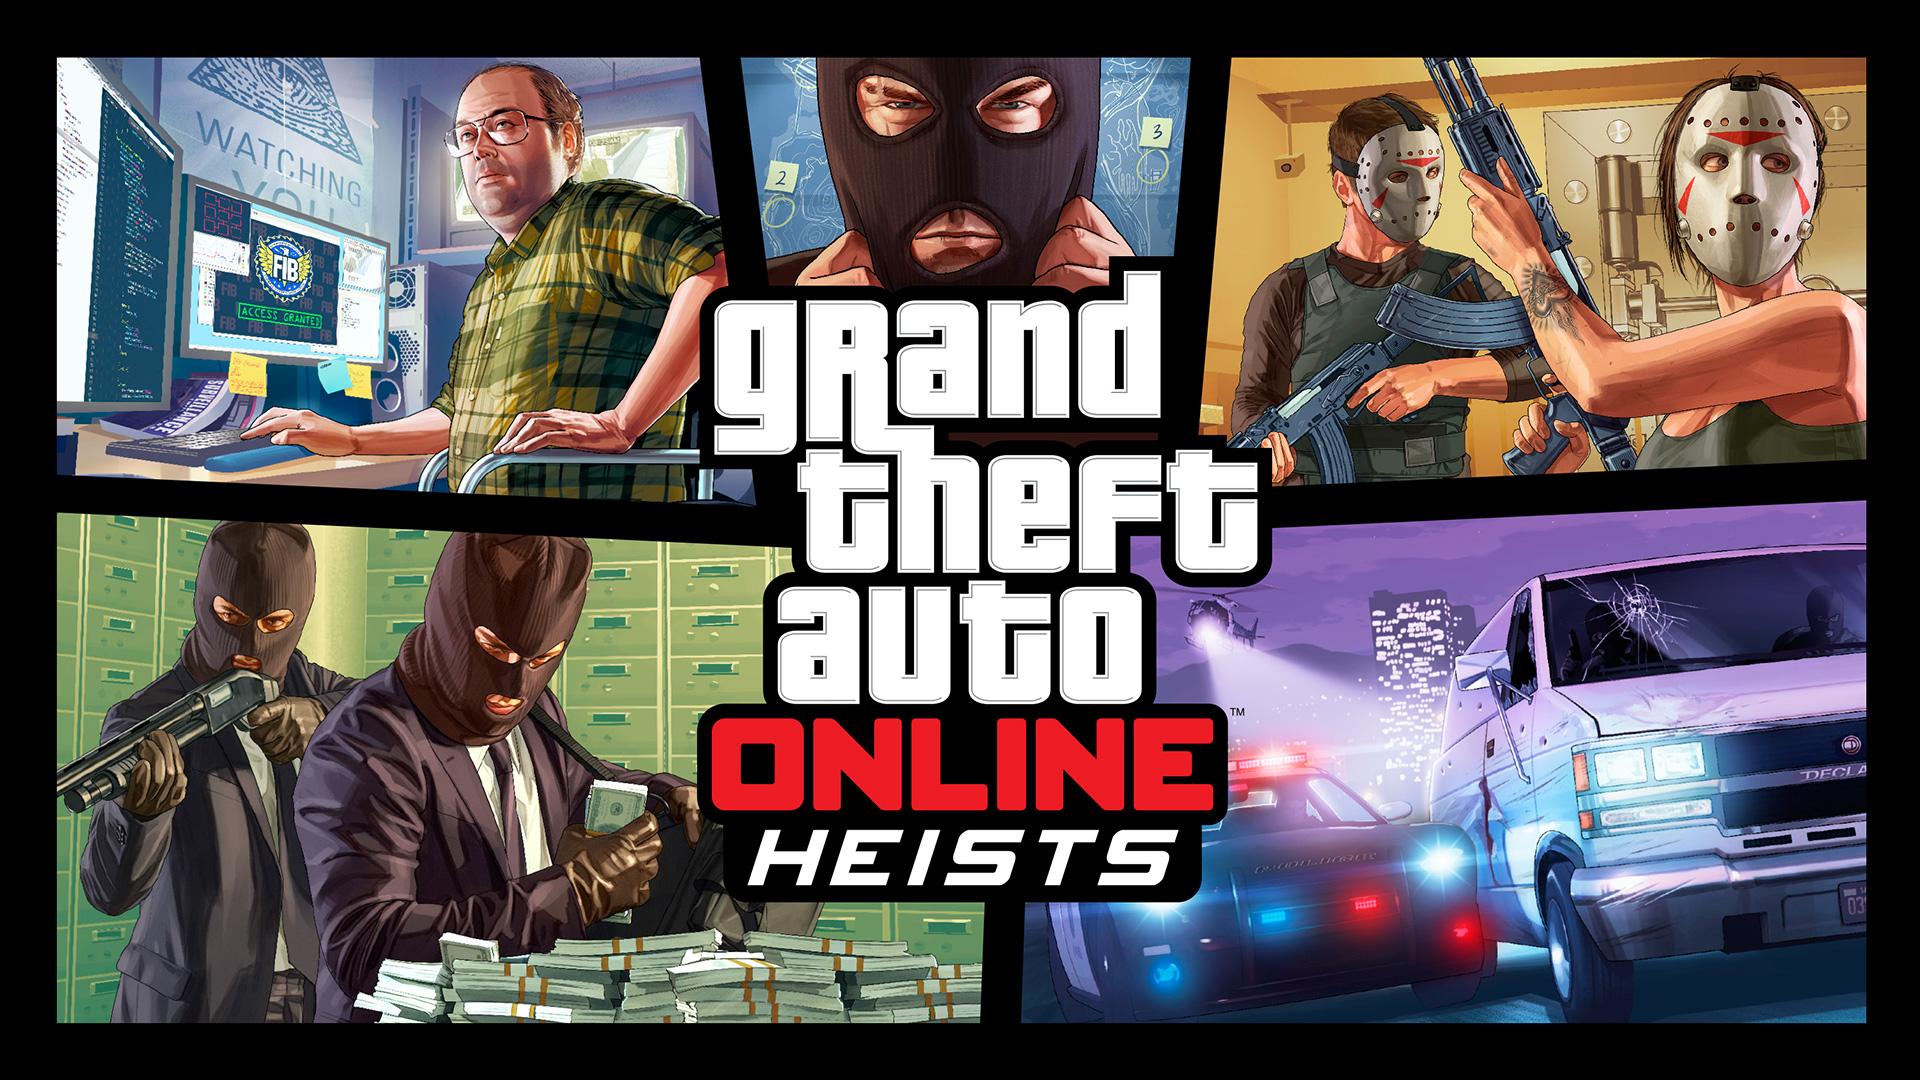 Grand Theft Auto Online Heists